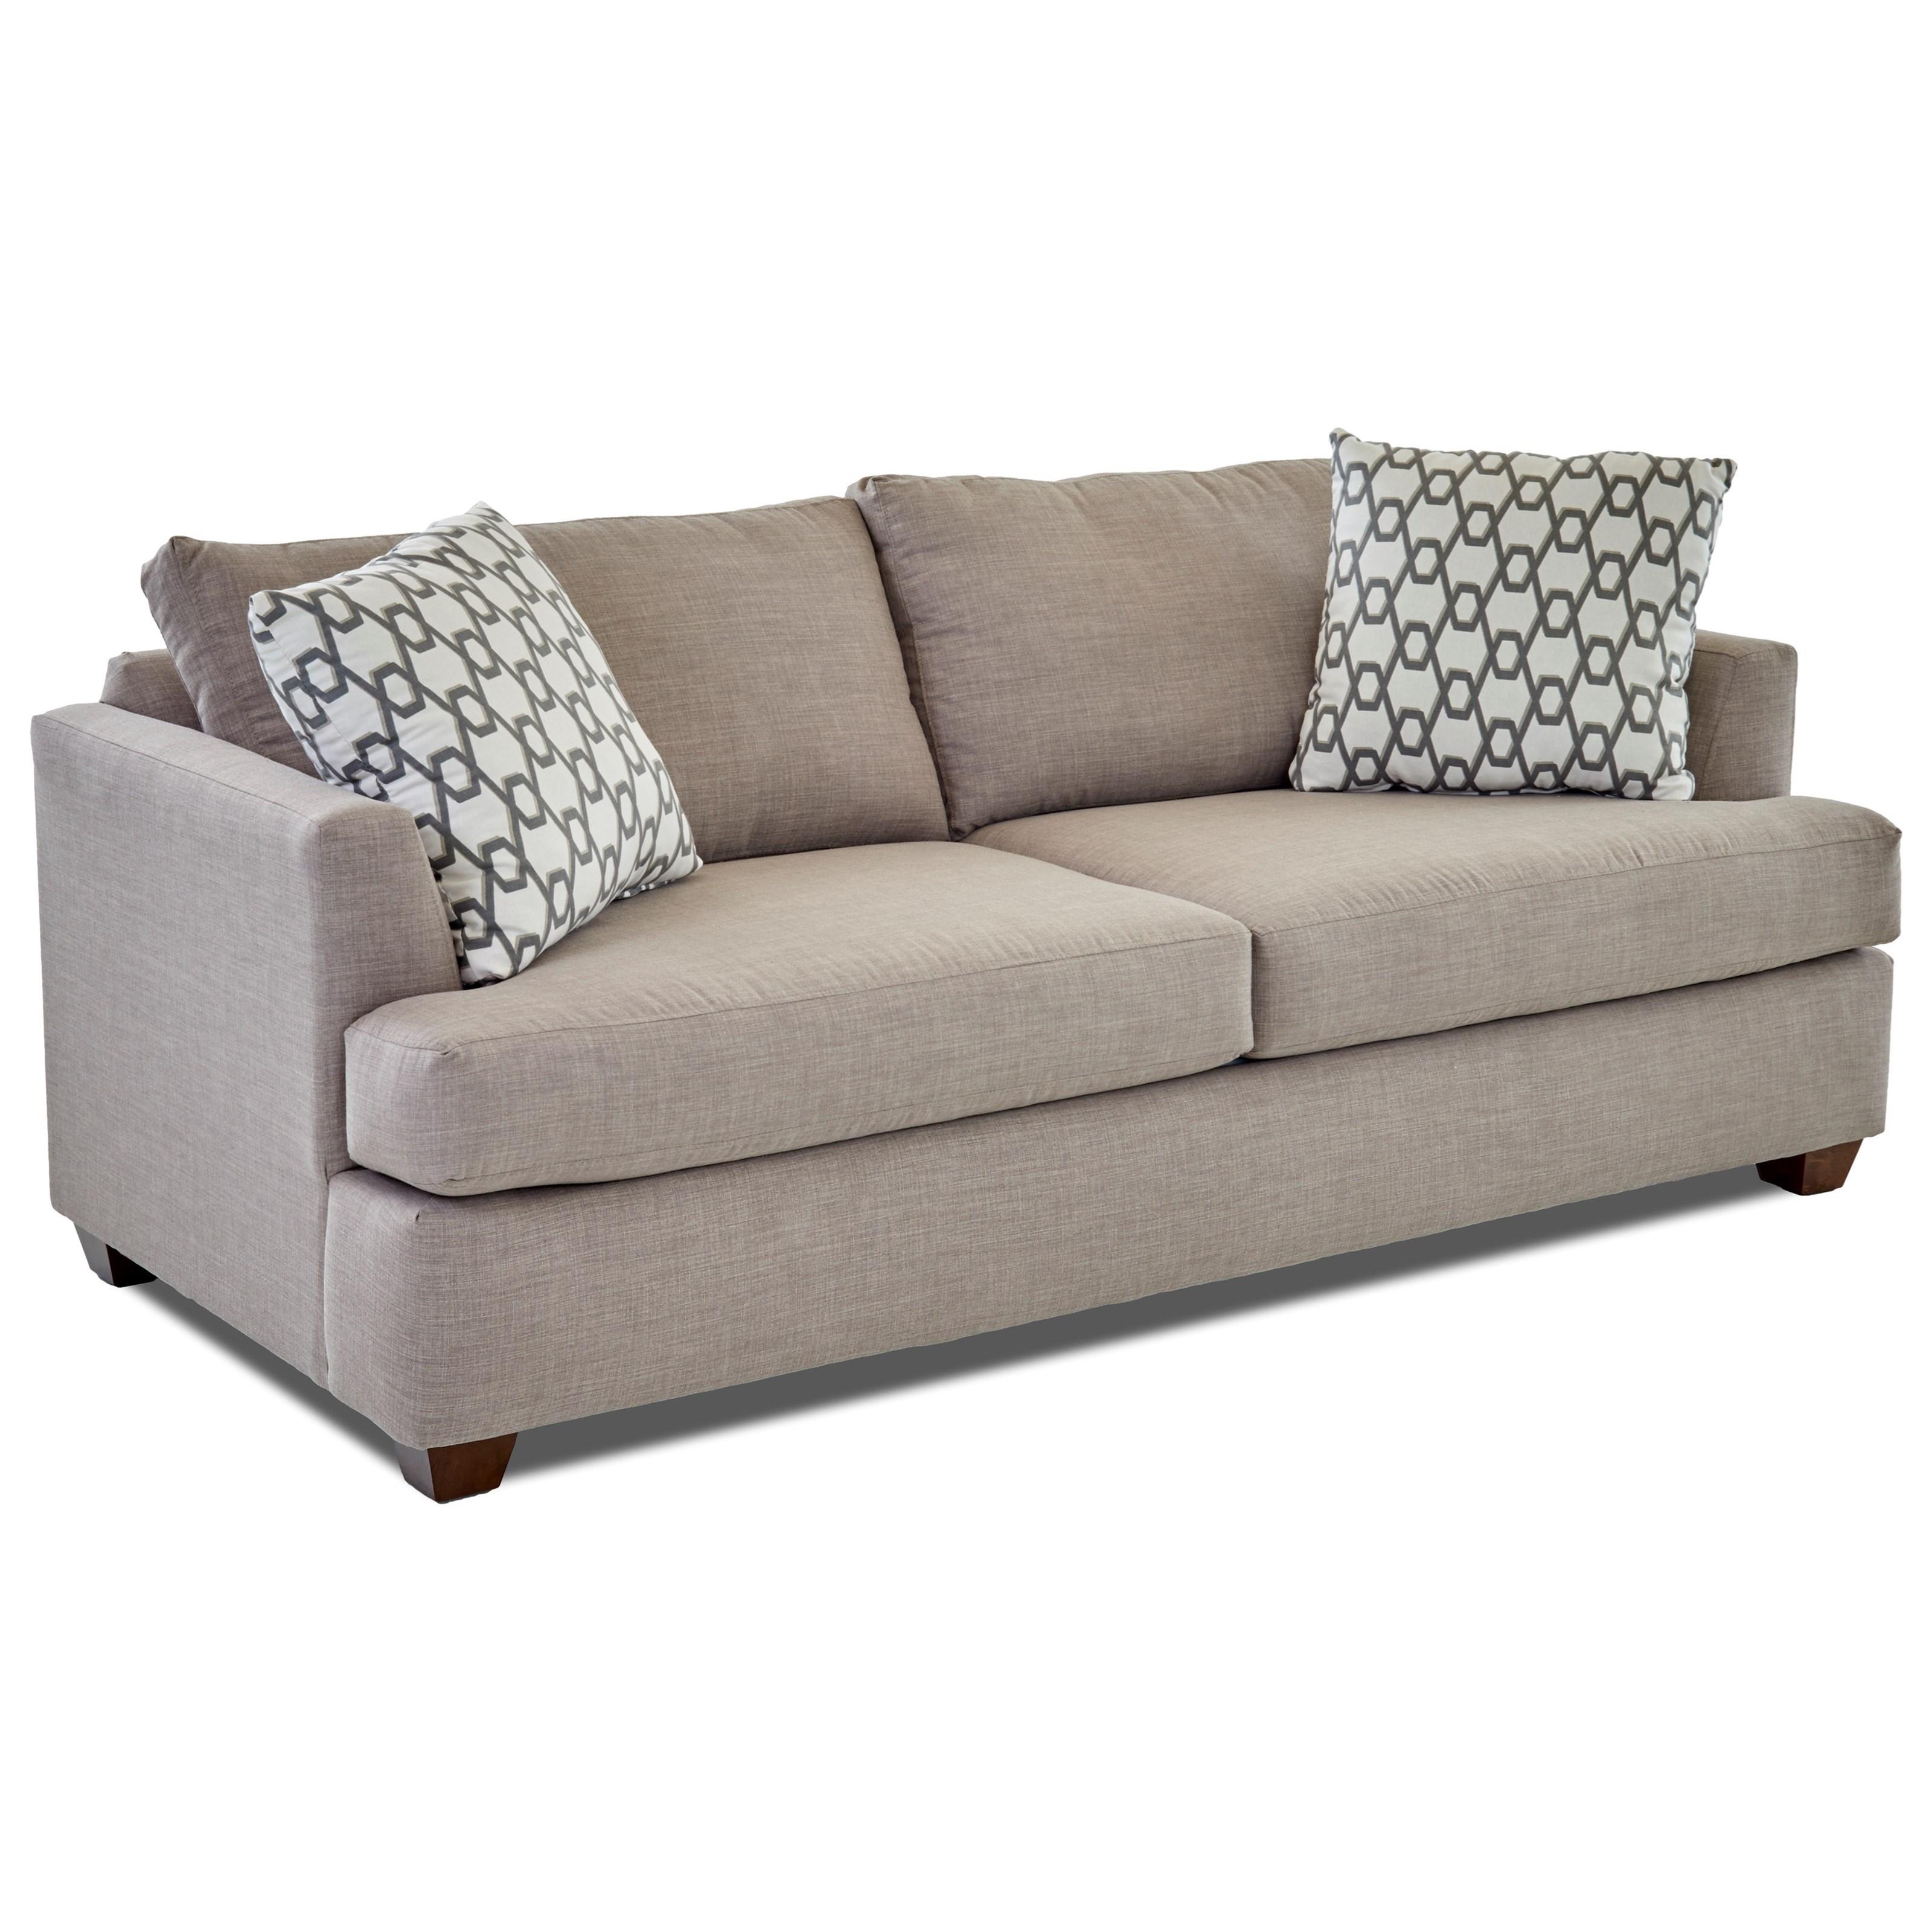 Klaussner jack k49500 iqsl queen inner spring sleeper sofa for Furniture jack